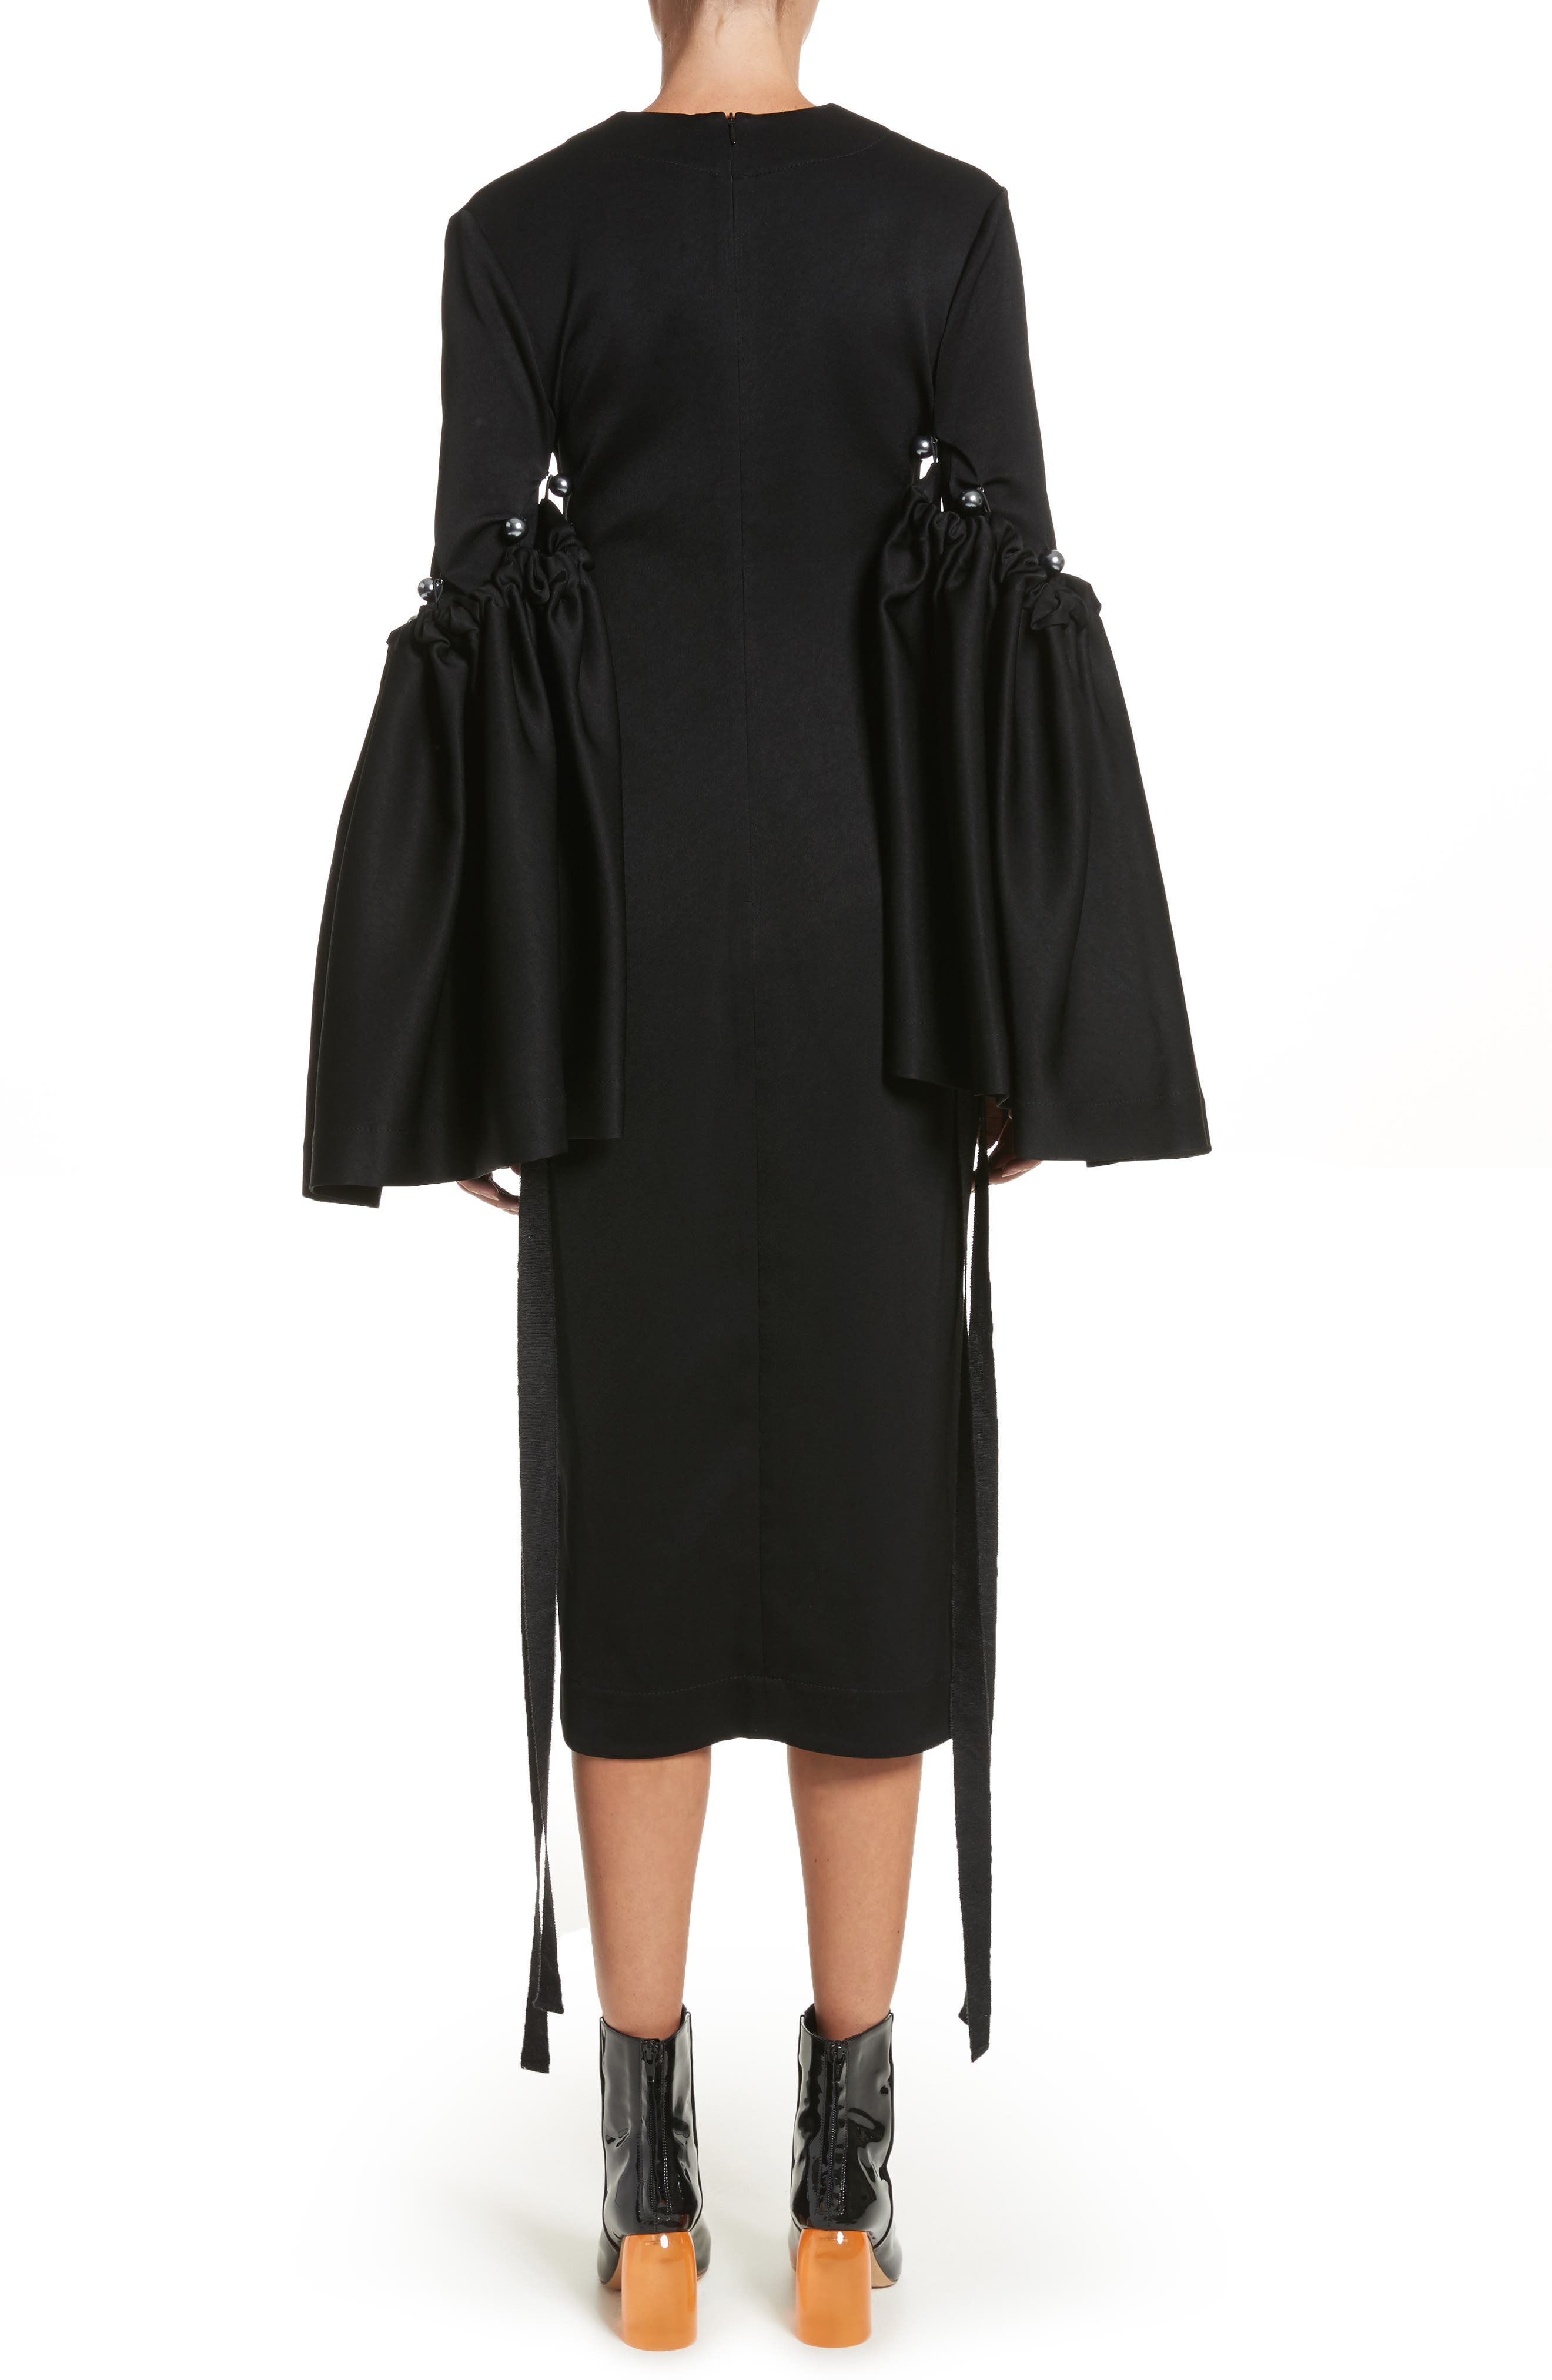 Adage Detachable Bell Sleeve Dress,                             Alternate thumbnail 2, color,                             001